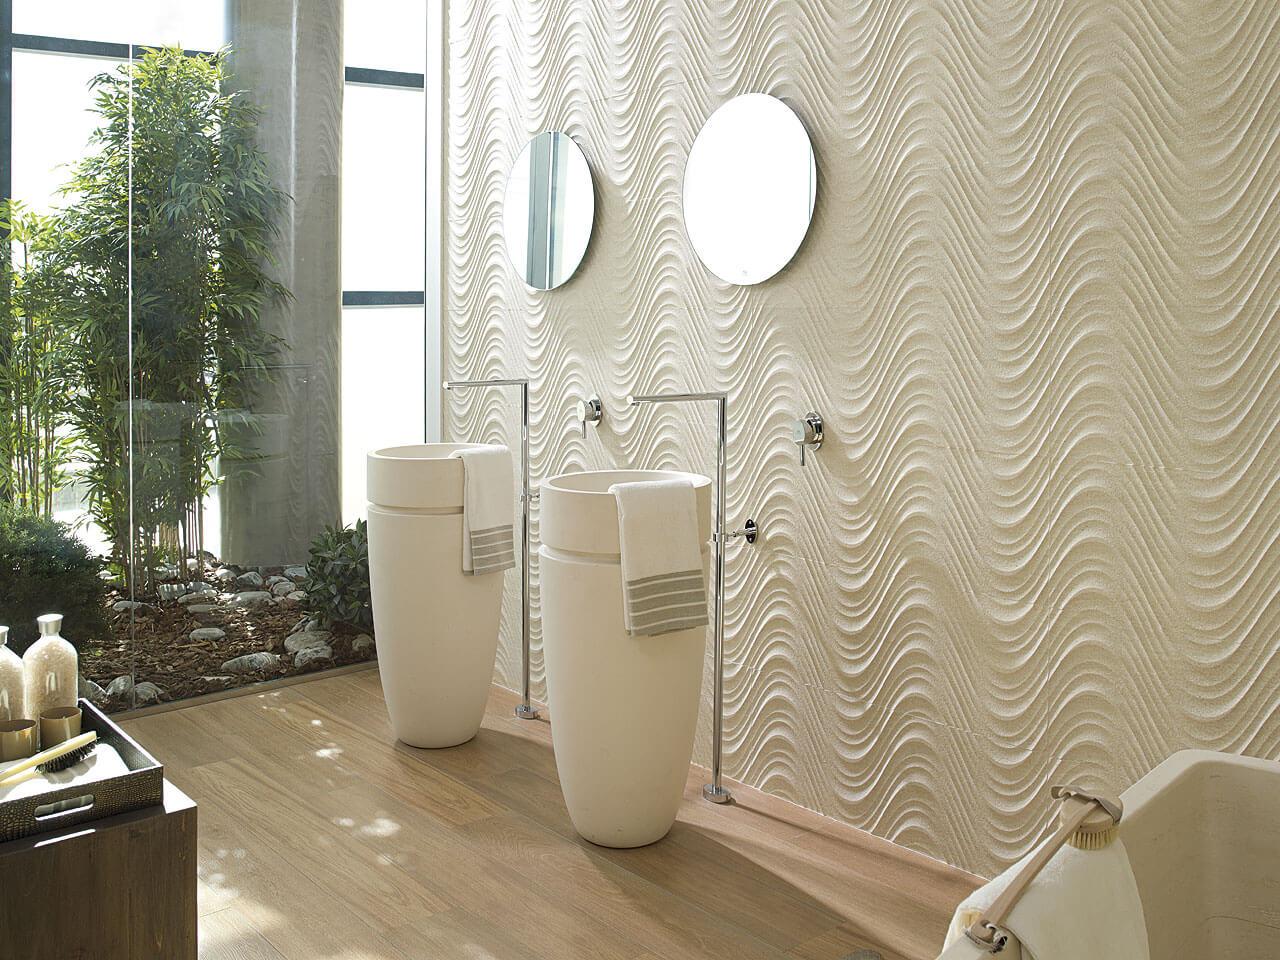 Porcelanosa Design Update 2019 In Valencia 18 22 01 2019